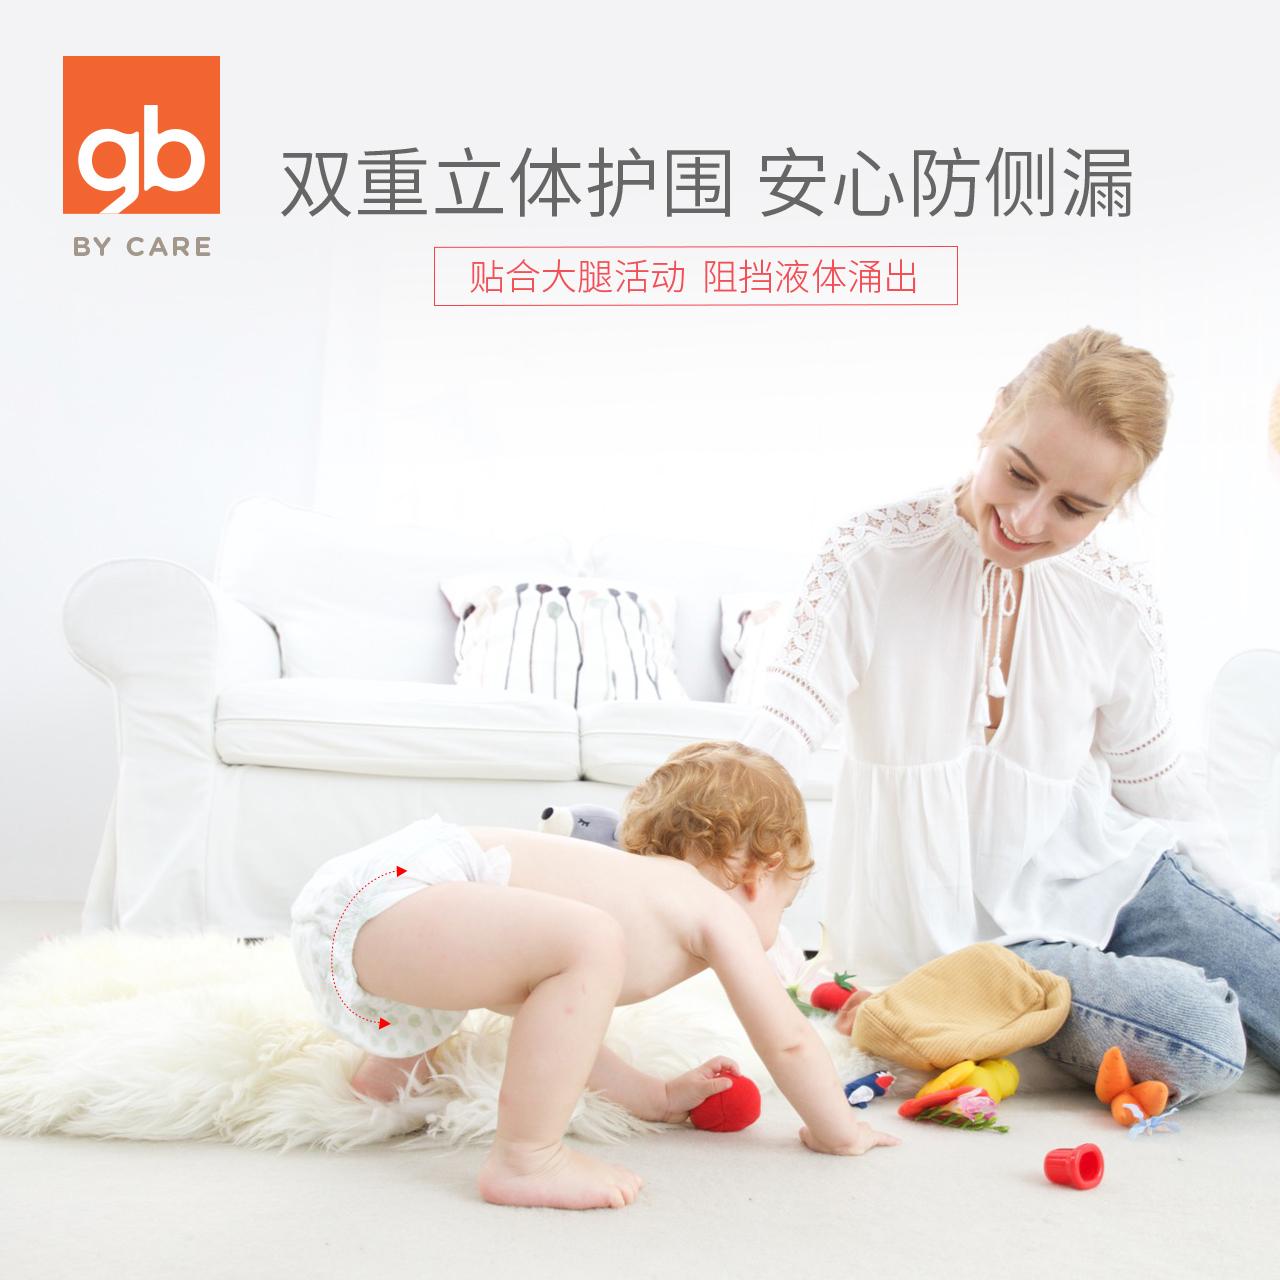 gb好孩子婴儿纸尿裤超薄透气尿不湿特薄舒爽新生宝宝纸尿裤XL28片